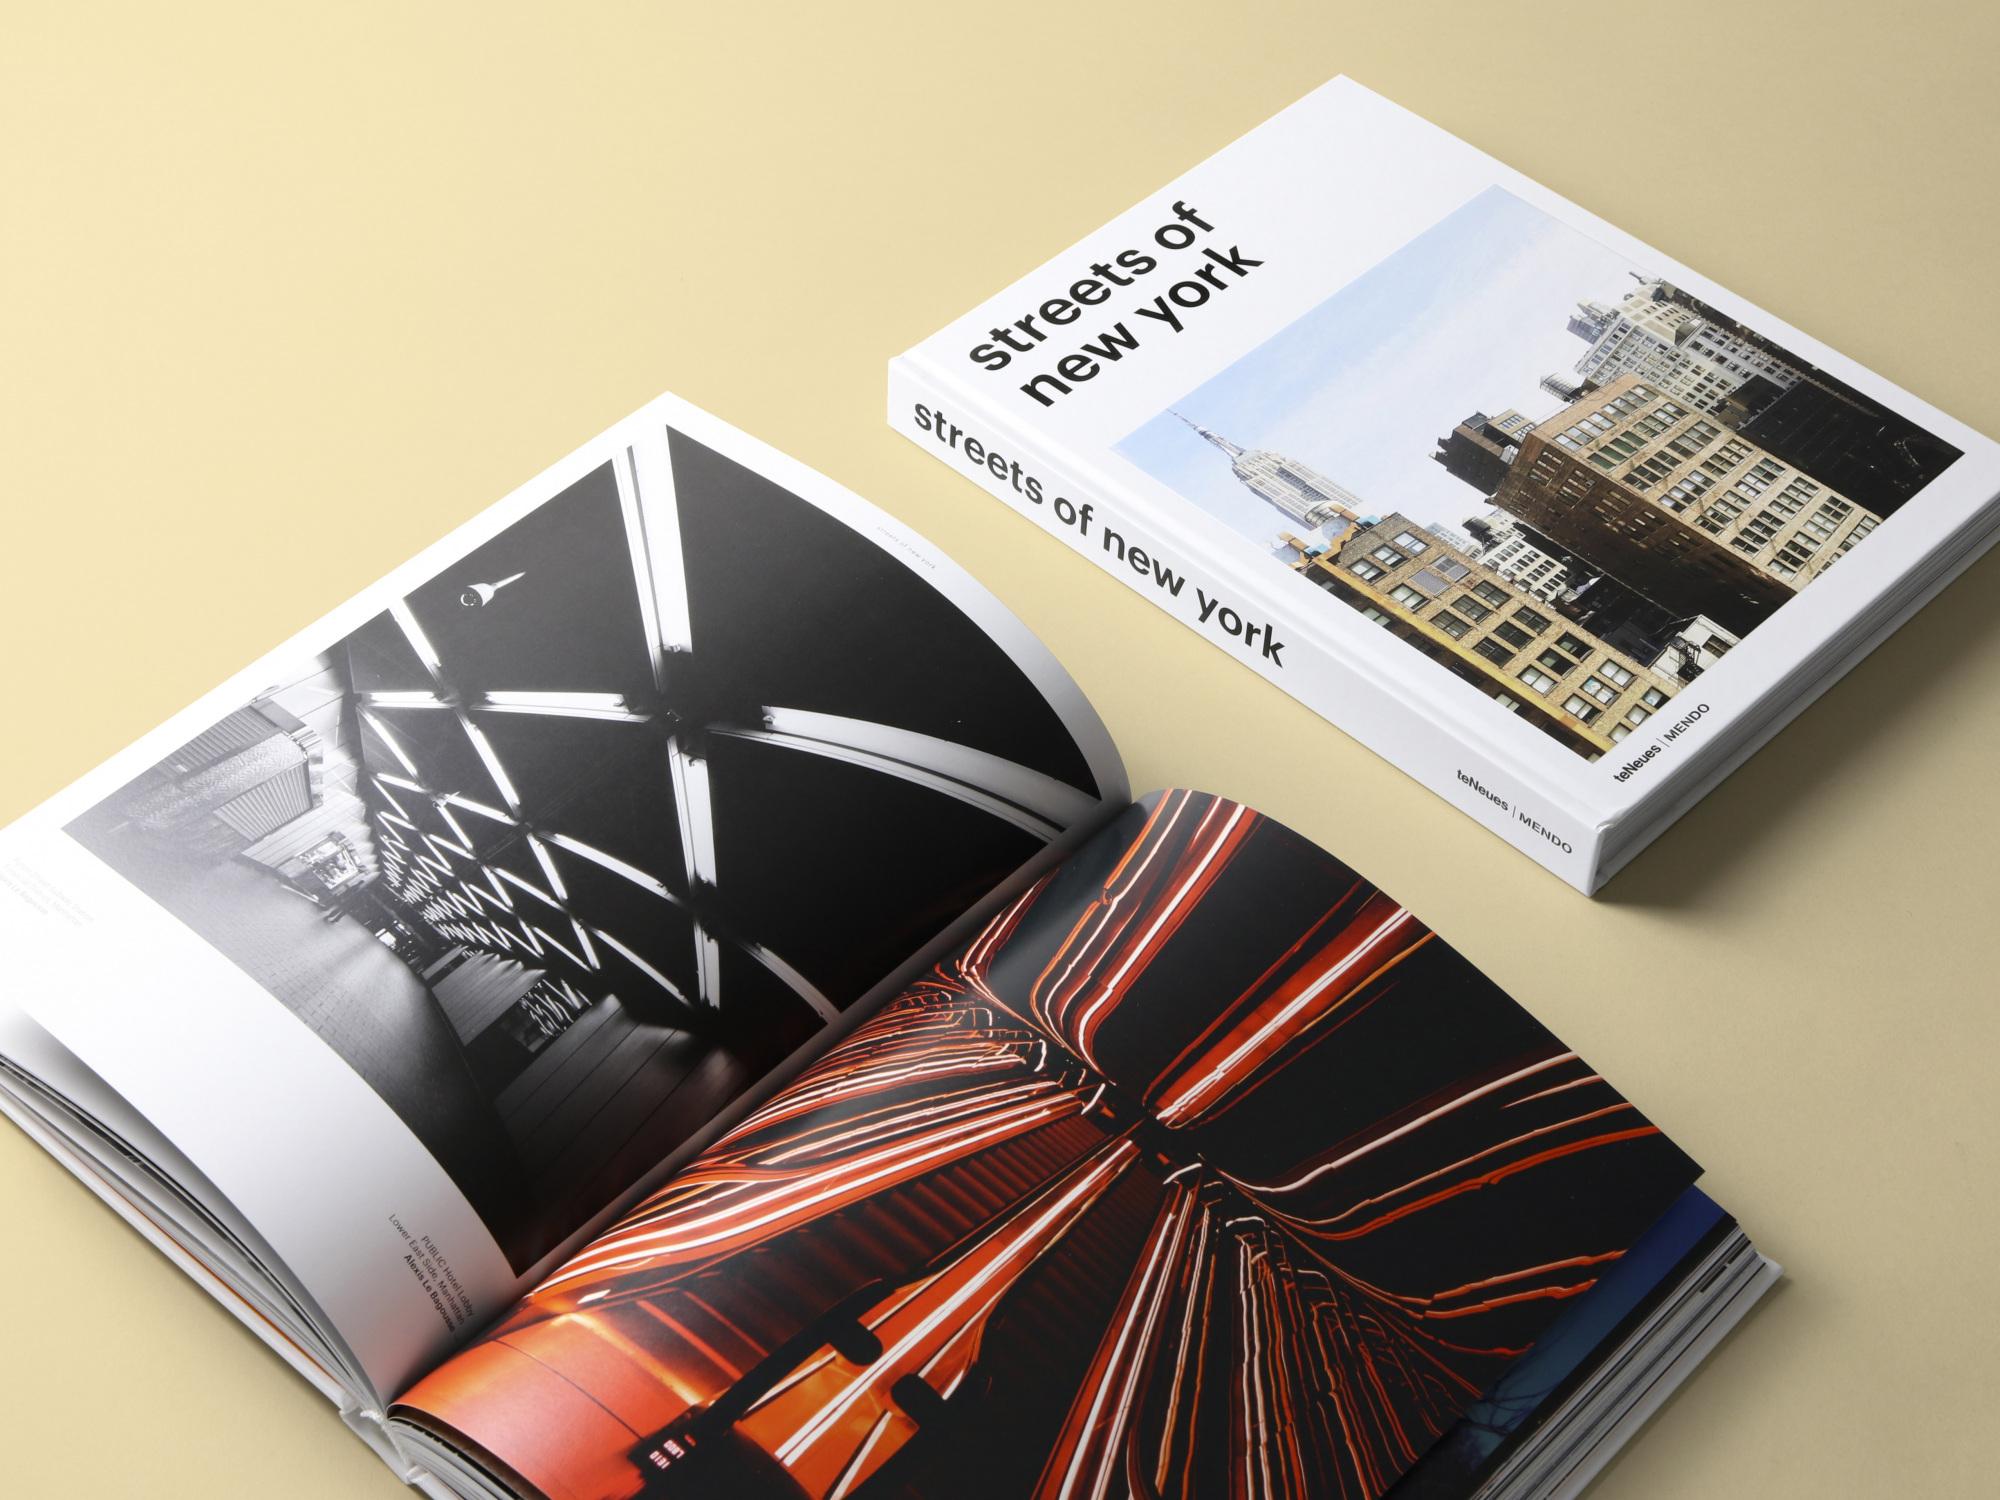 mendo-book-streets-of-new-york-02-2000x1500-c-default.jpg